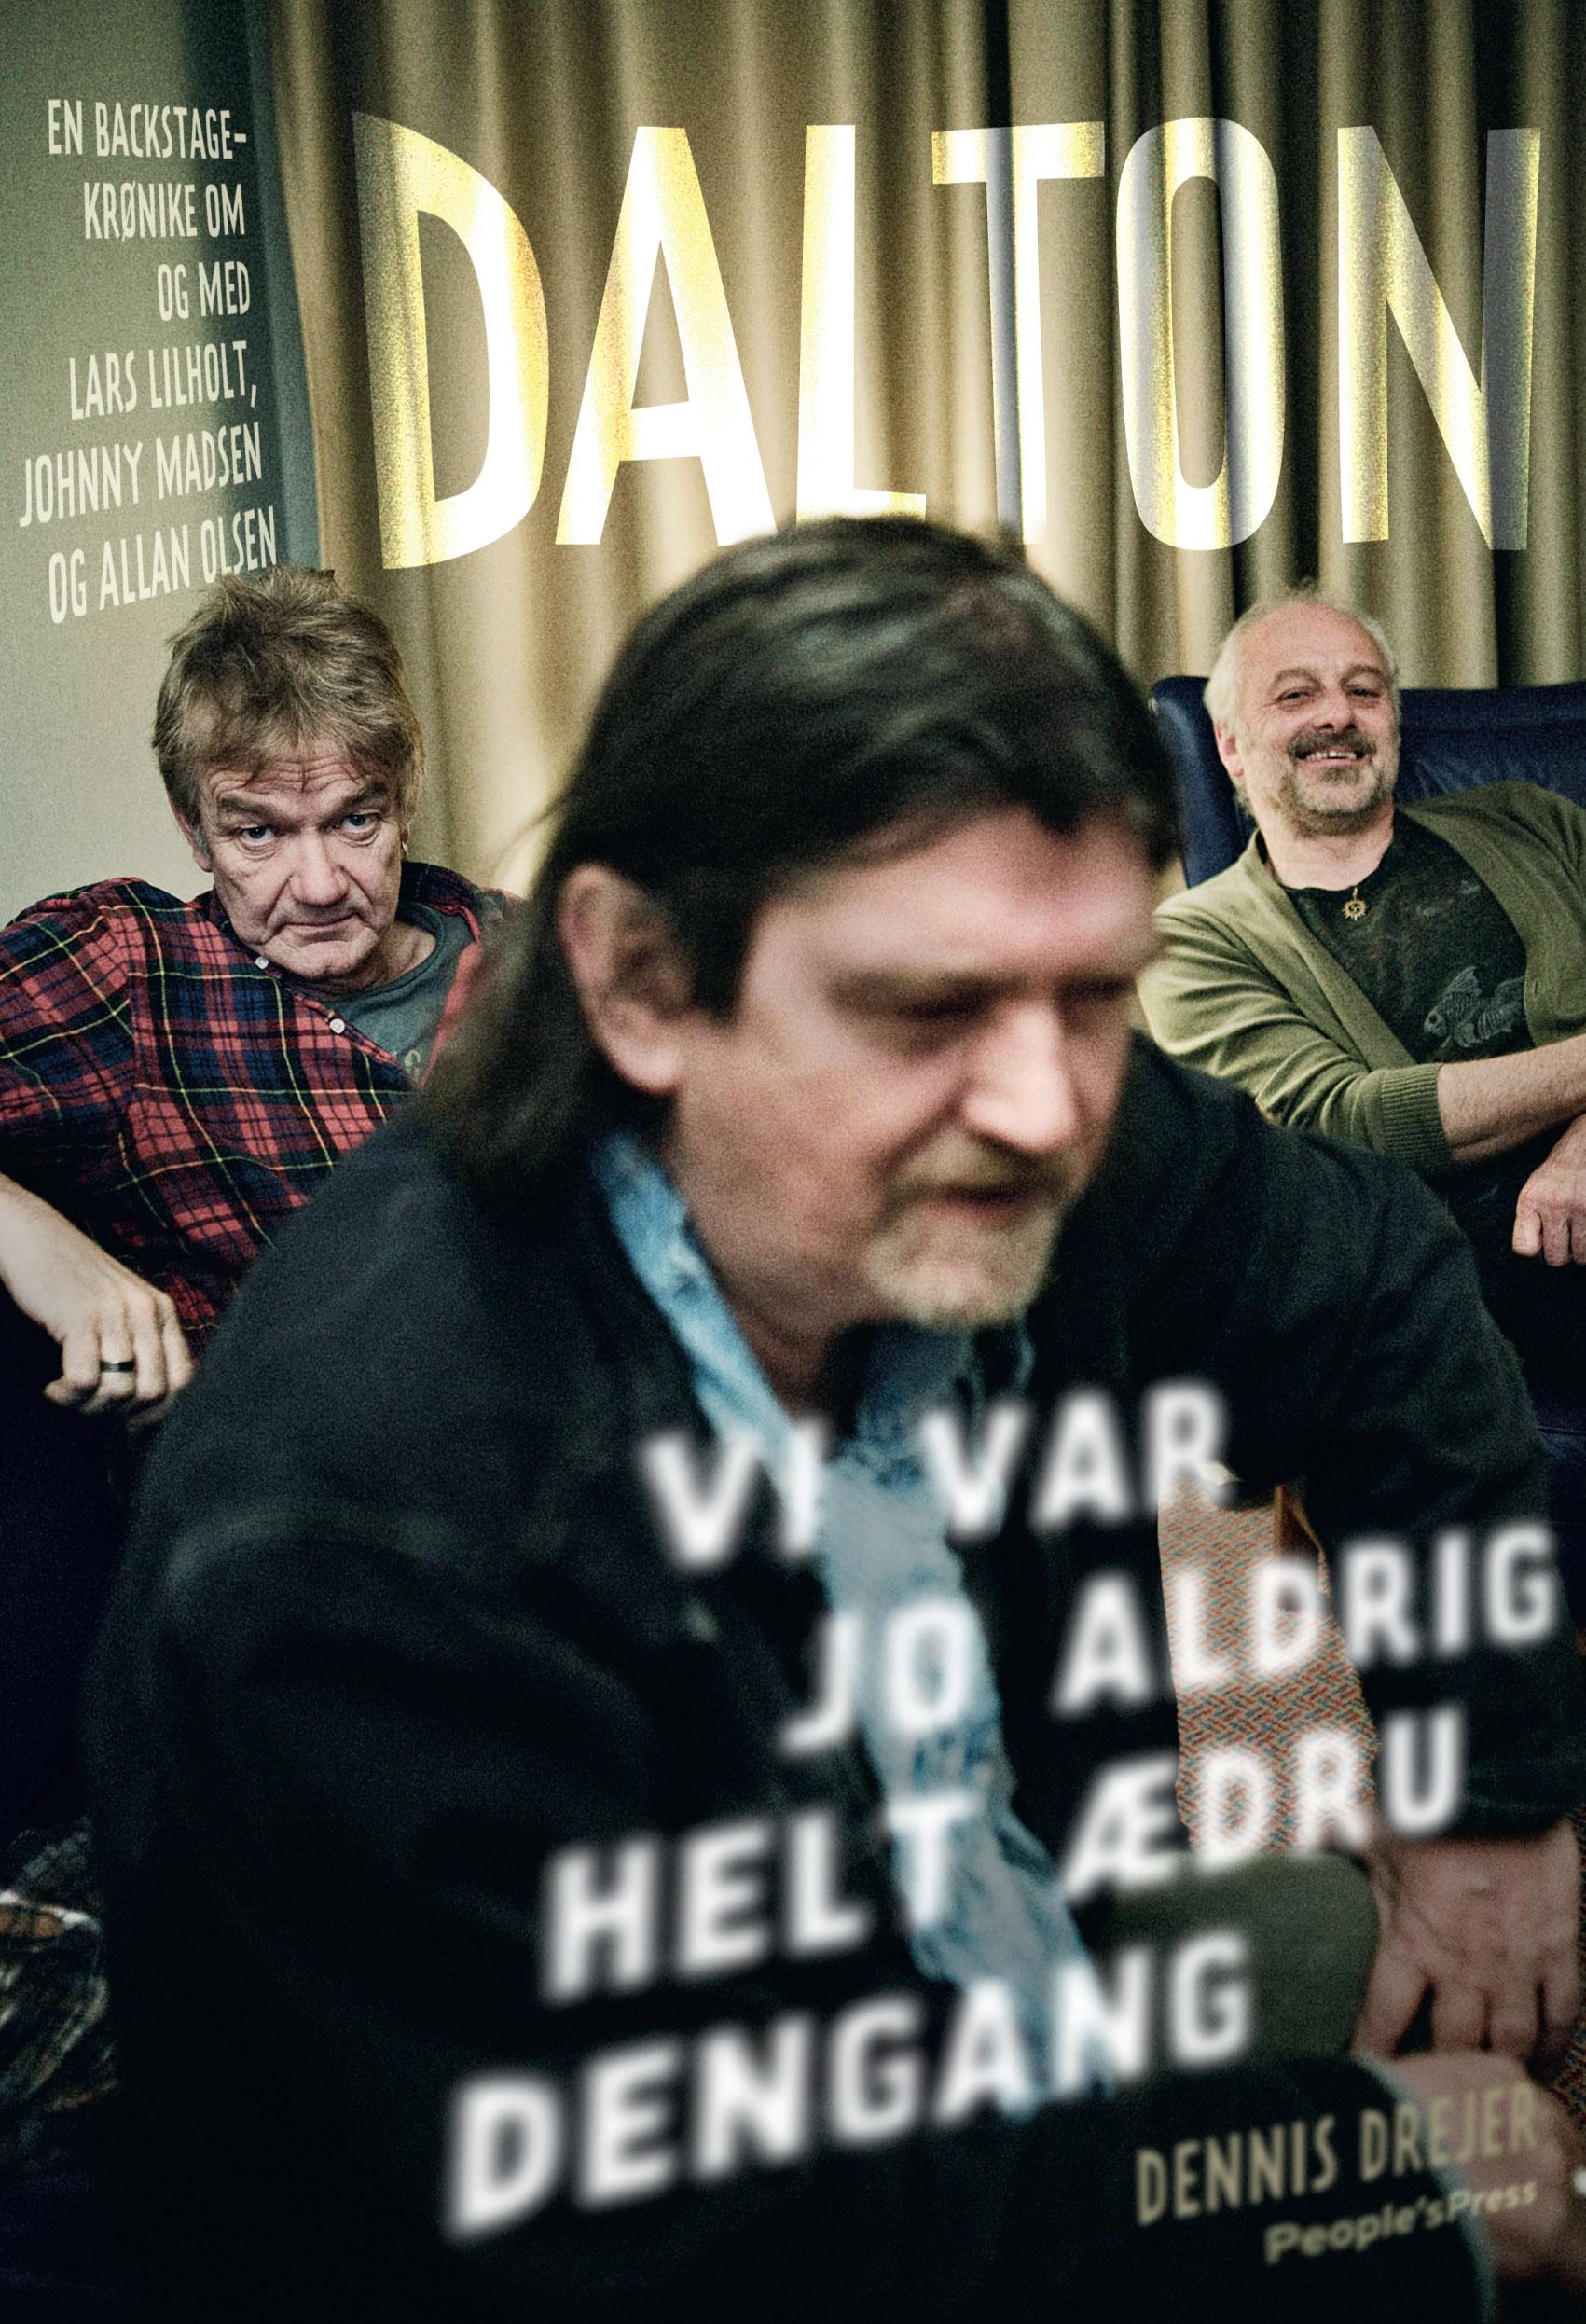 Dalton - Lars Lilholt, Johnny Madsen og Allan Olsen